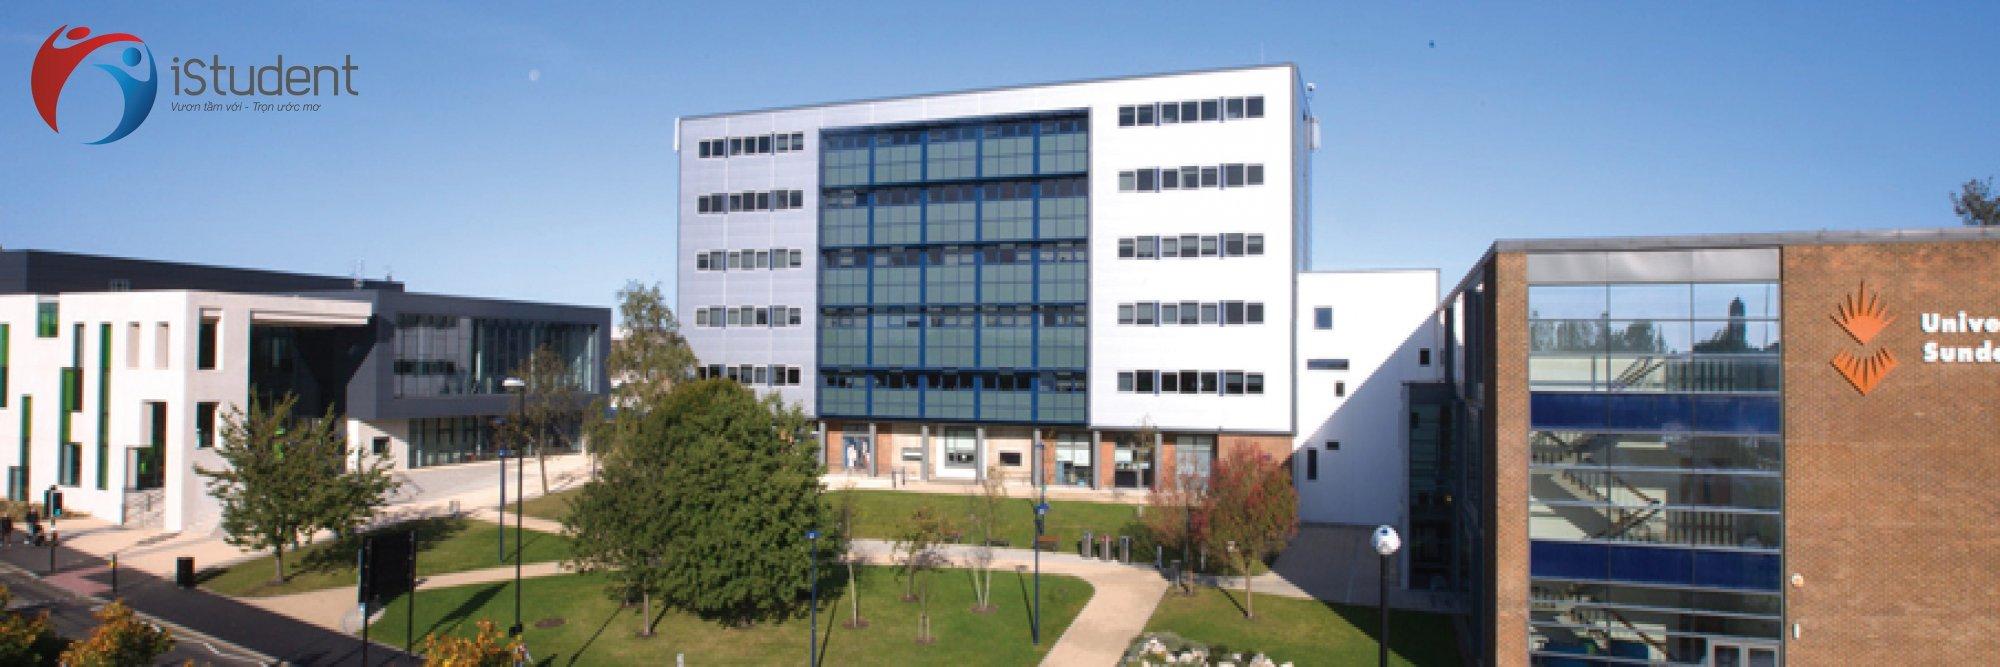 University of Sunderland - Du học Anh